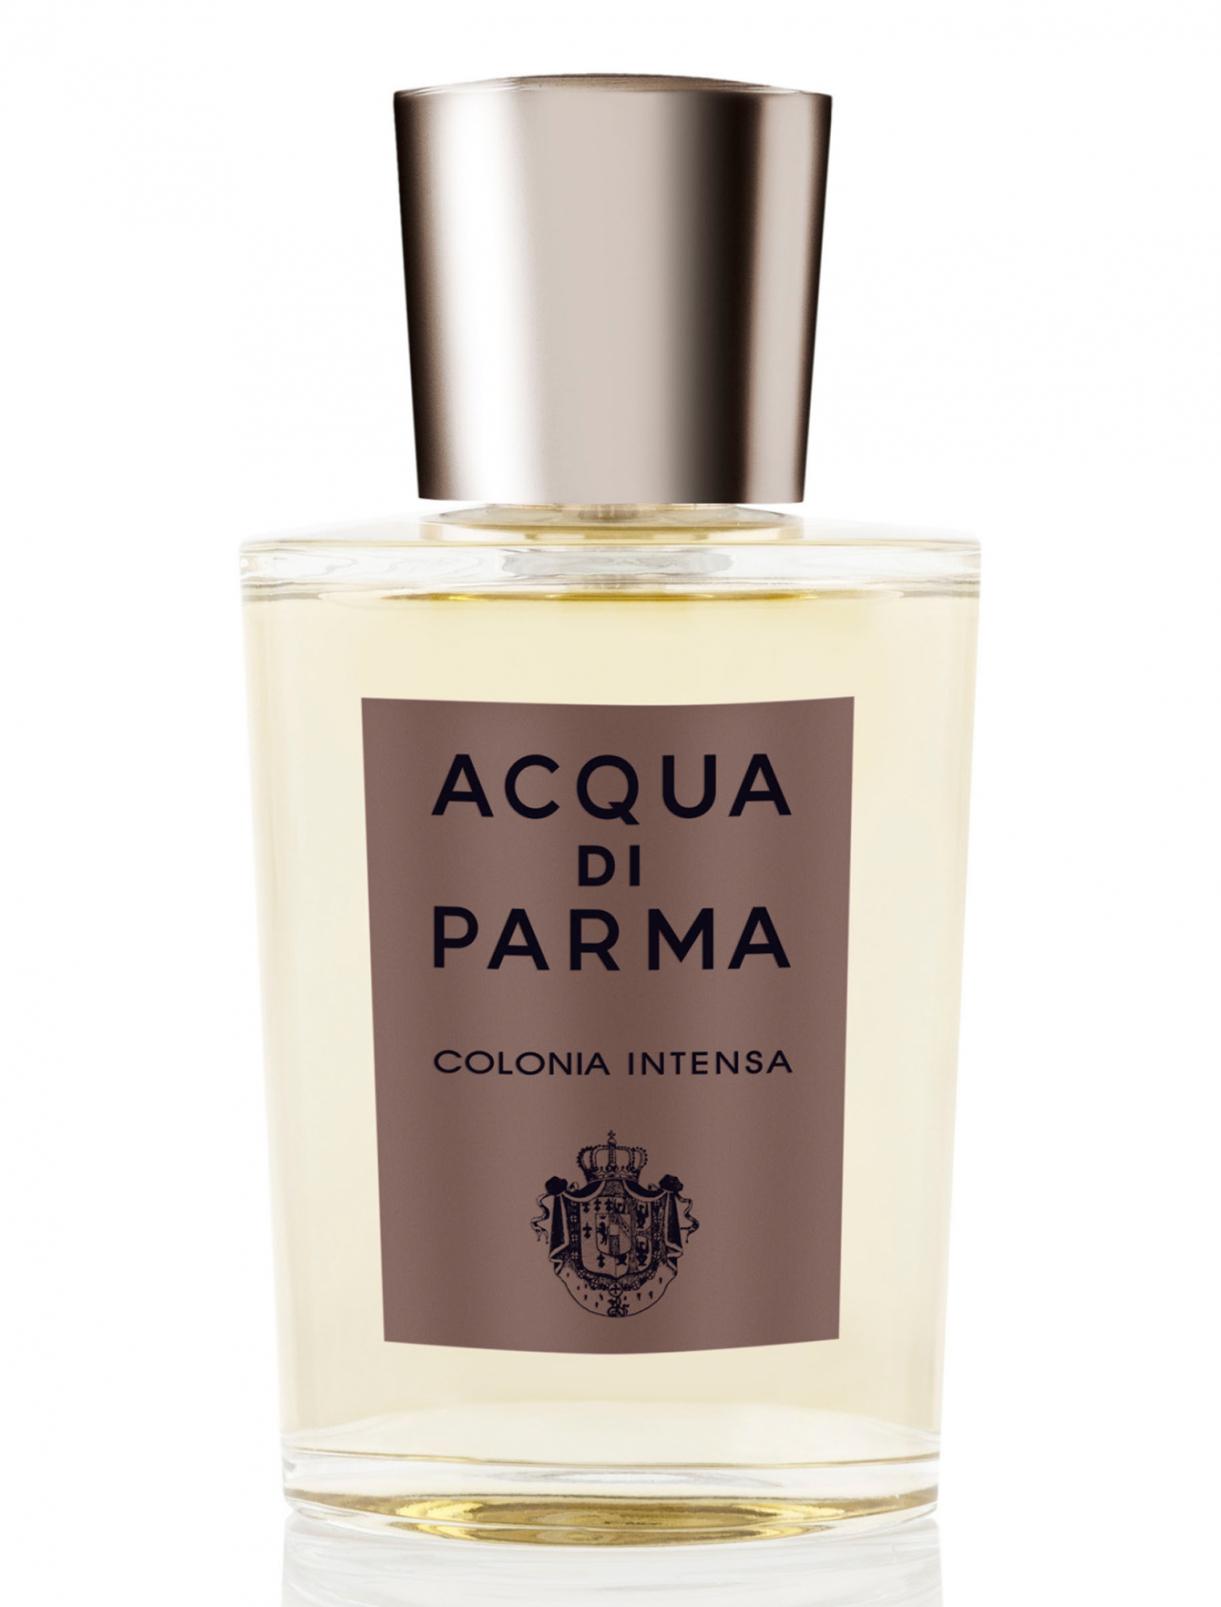 Одеколон - Colonia Intensa, 50ml Acqua di Parma  –  Общий вид